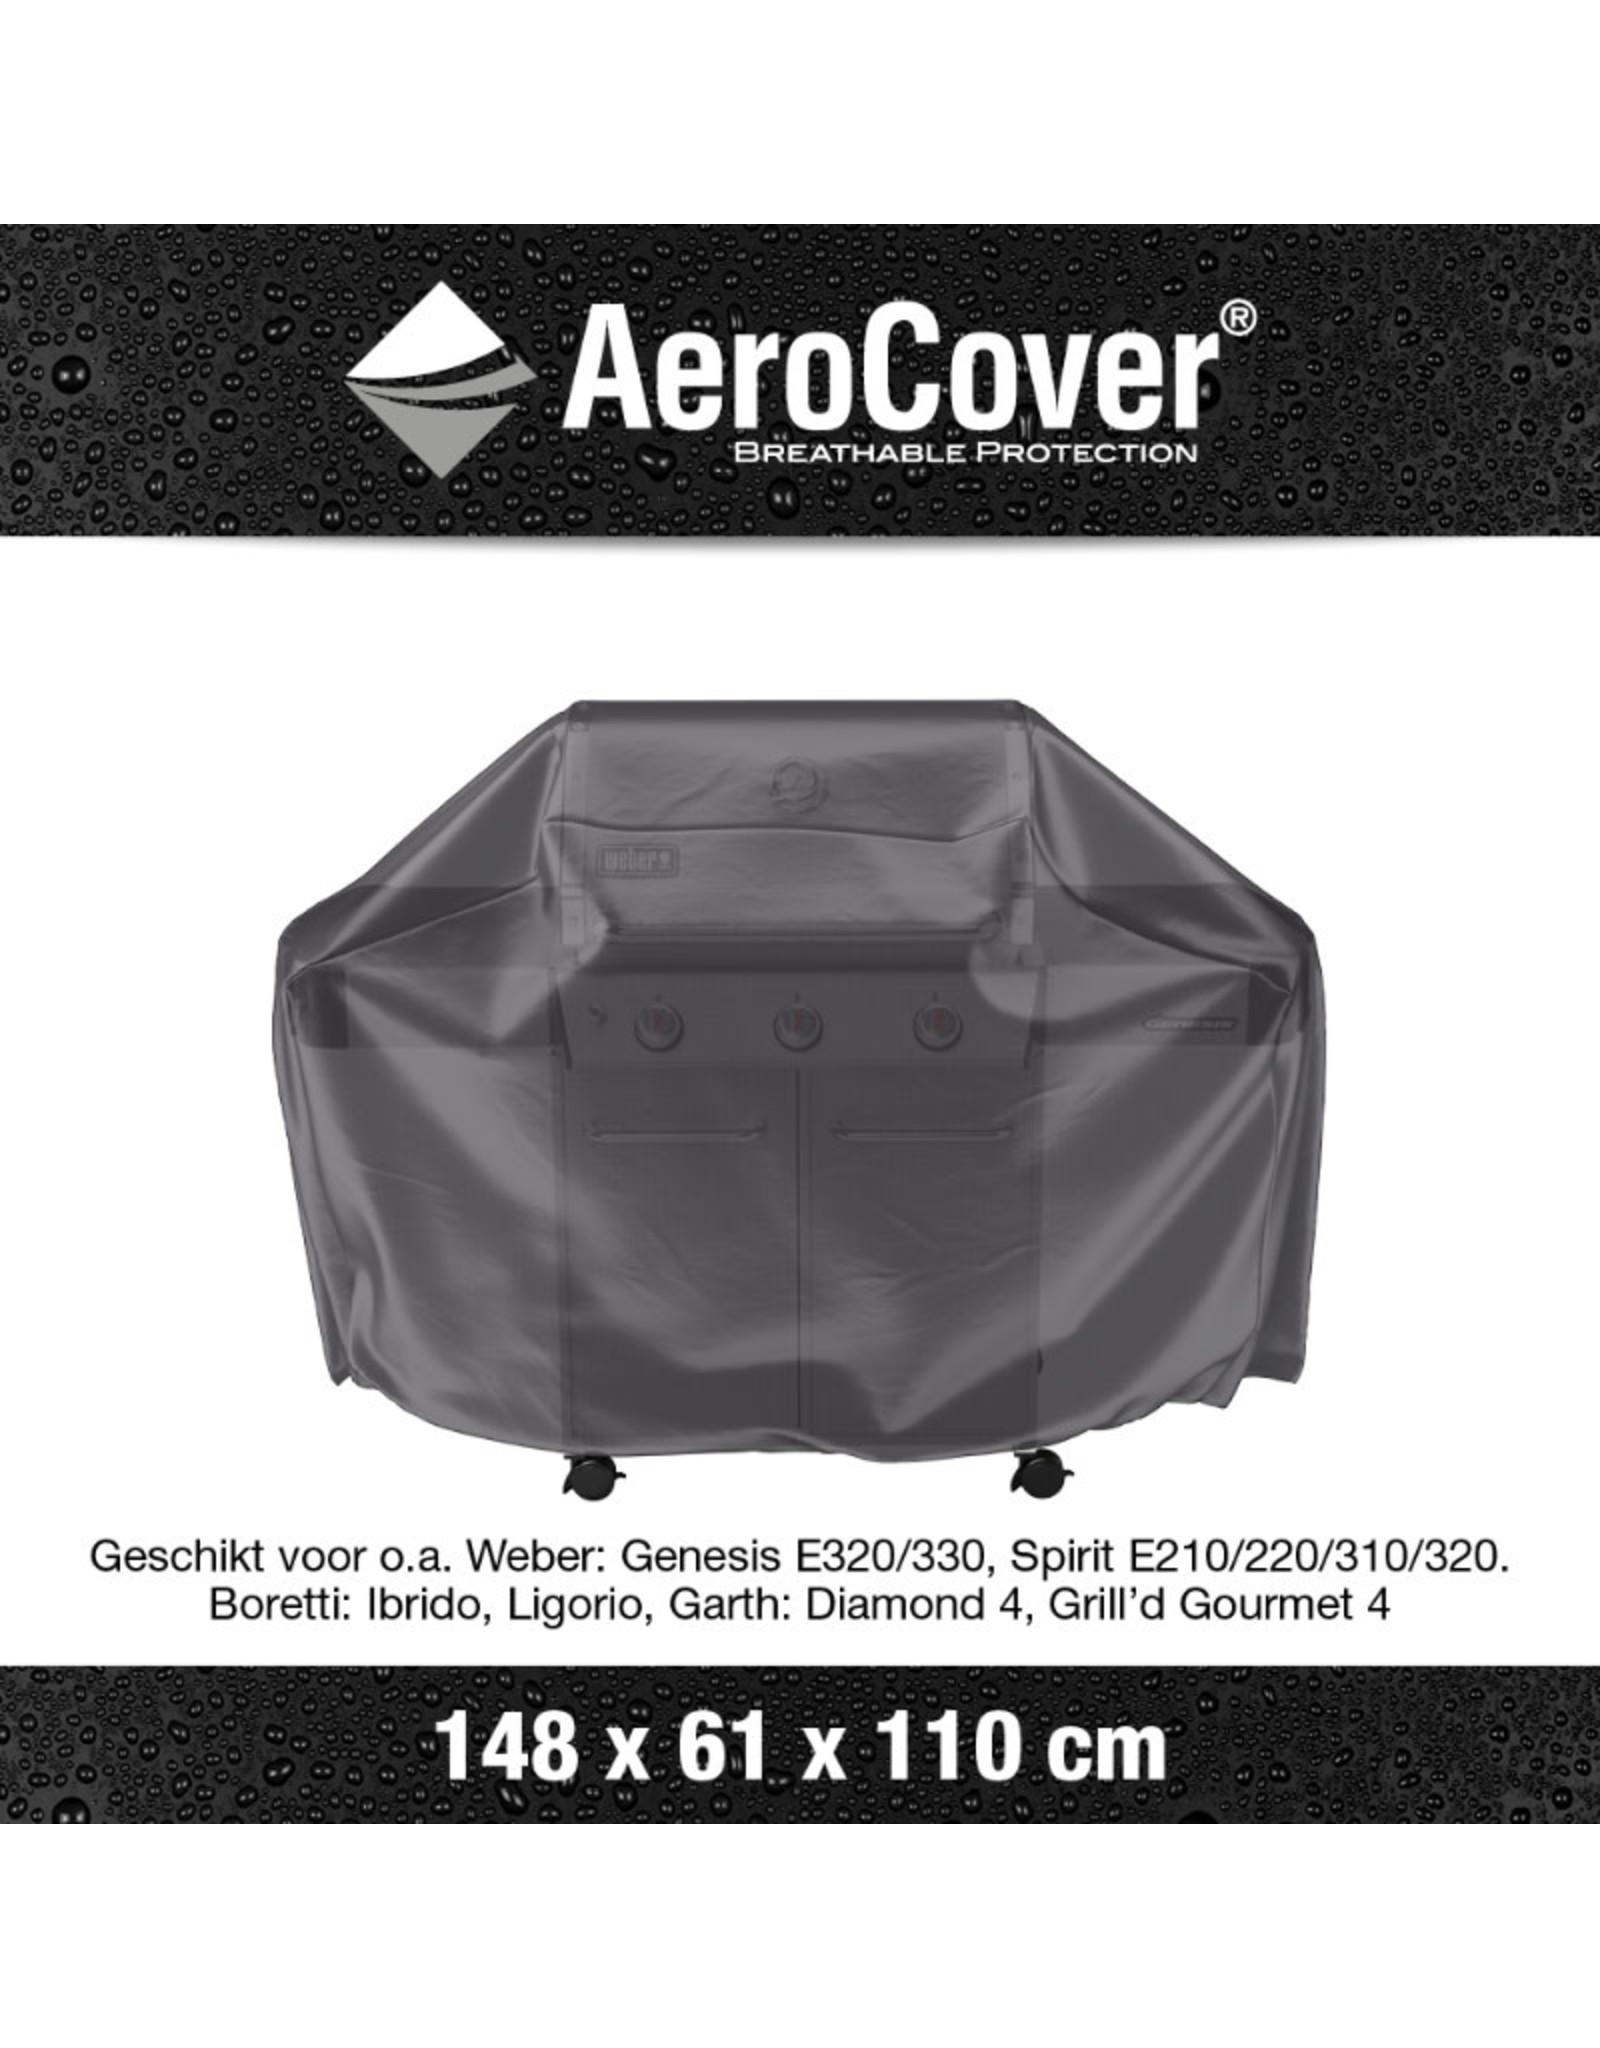 Aerocover AeroCover Gasbarbecue hoes L